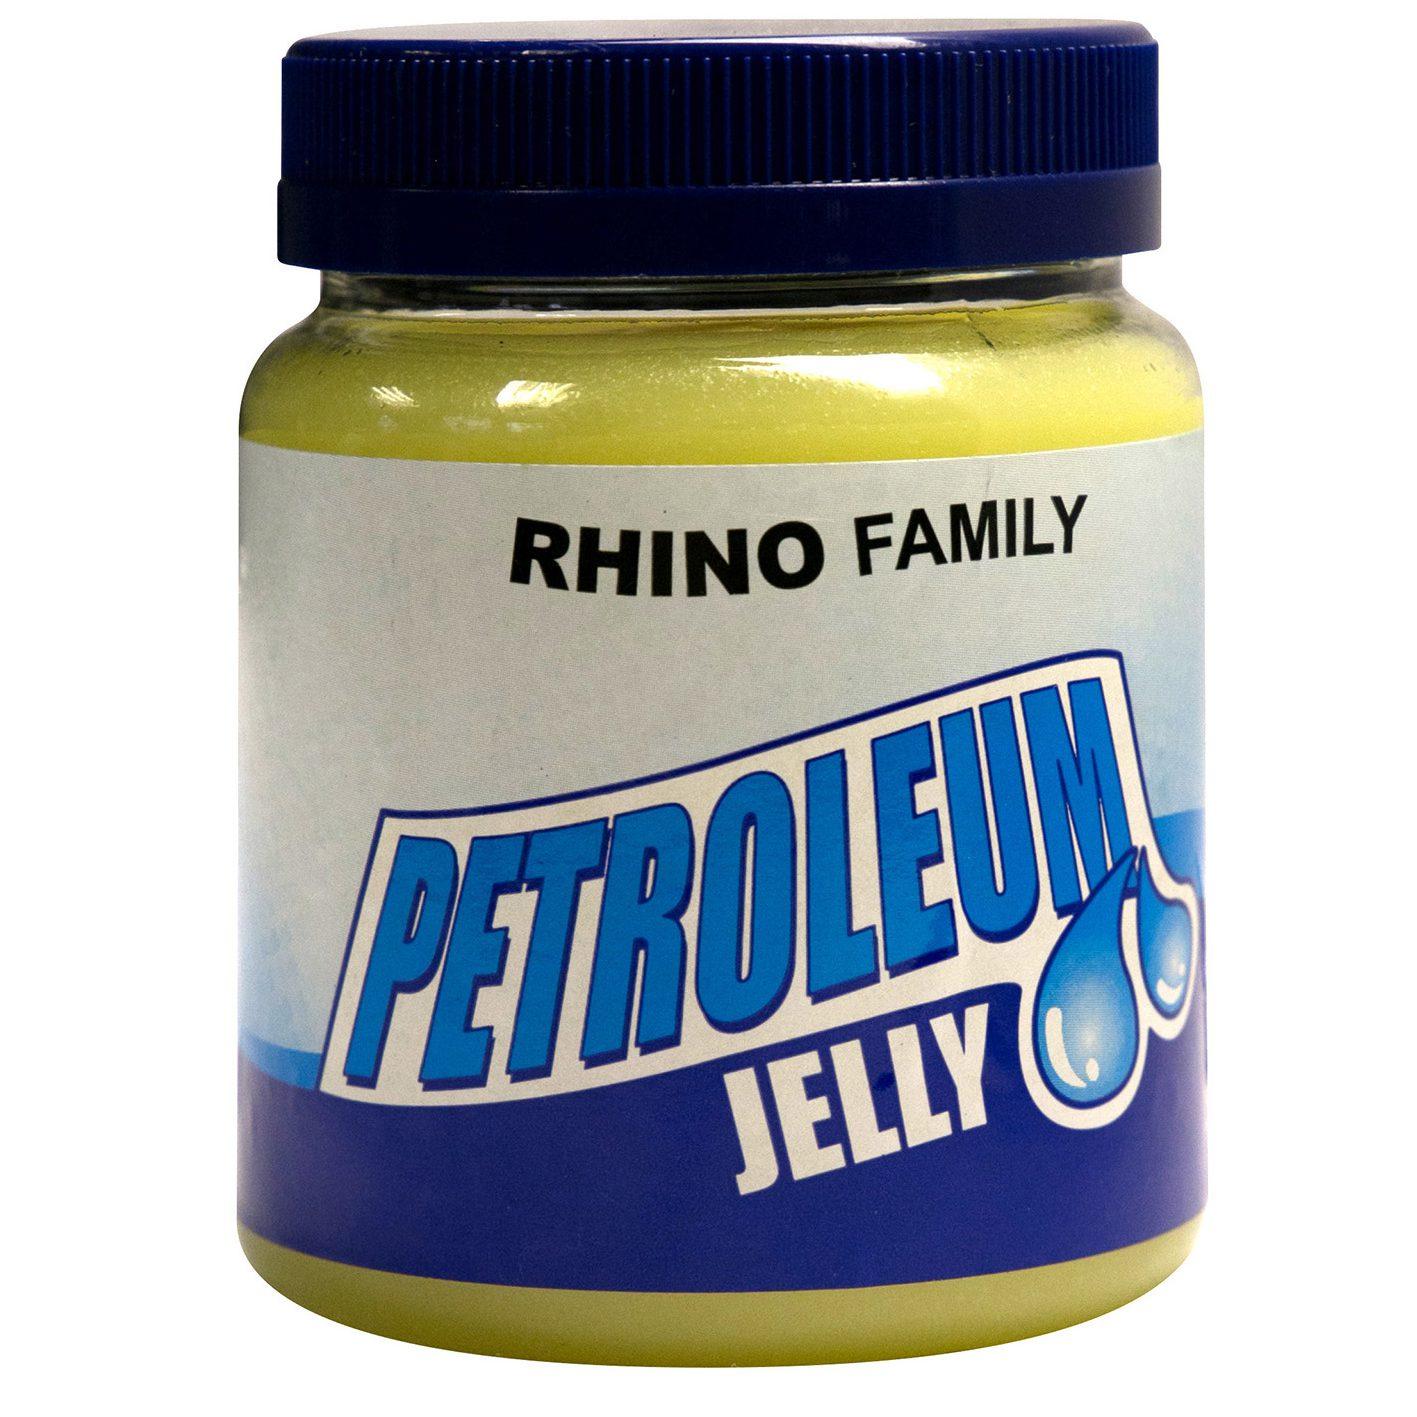 Rhino Pet Jelly 100ml